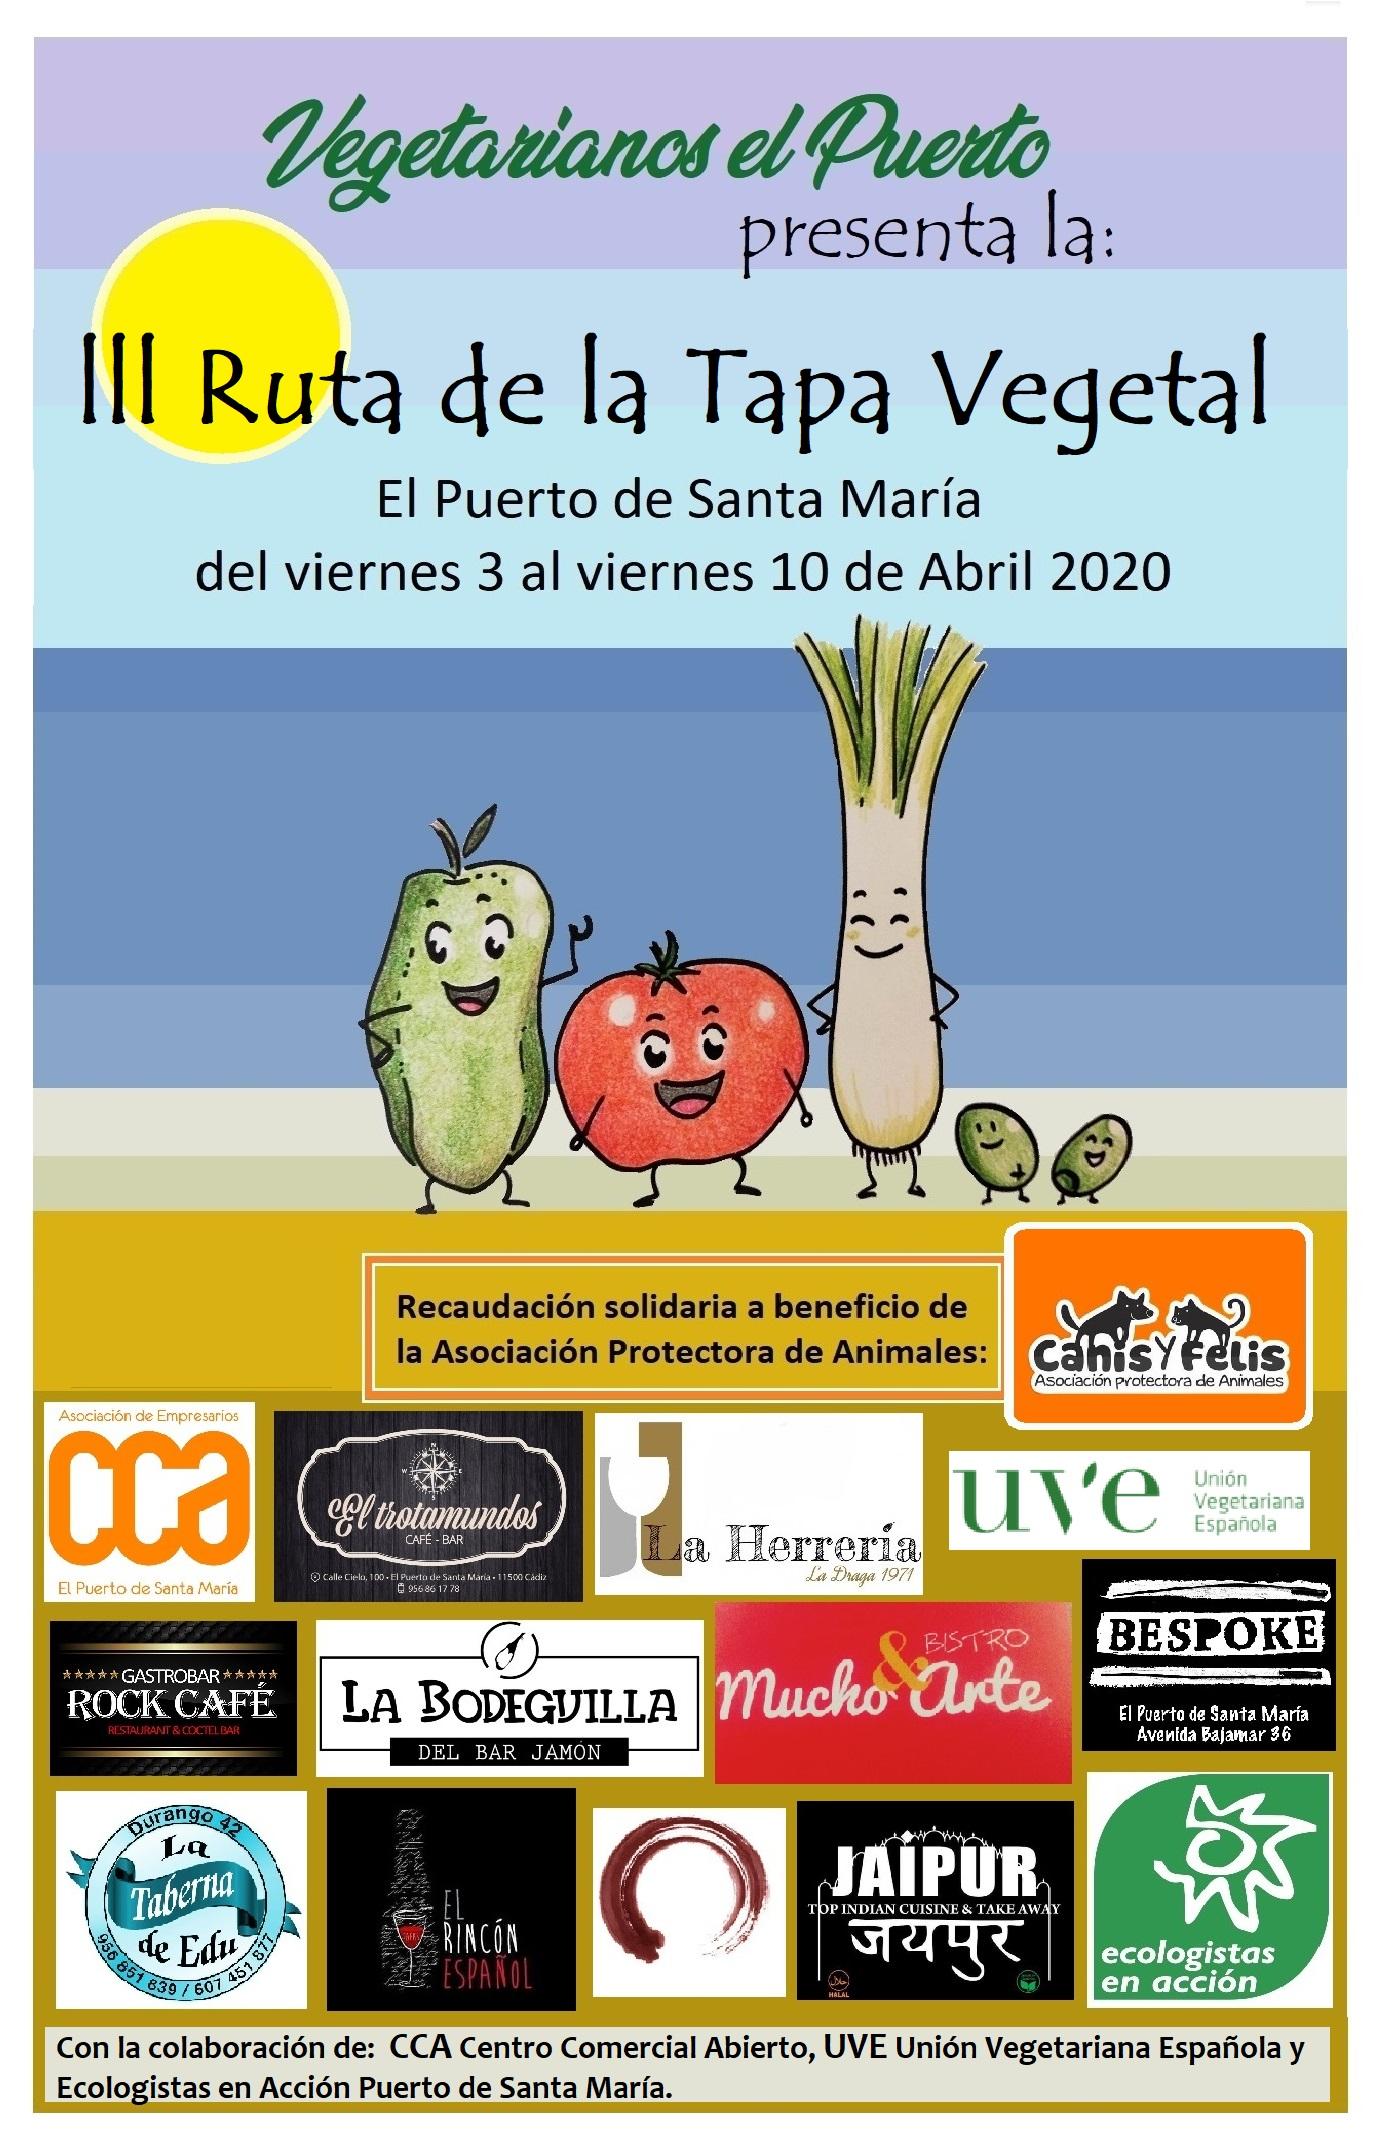 III Ruta de la Tapa Vegetal  Semana Santa 2020